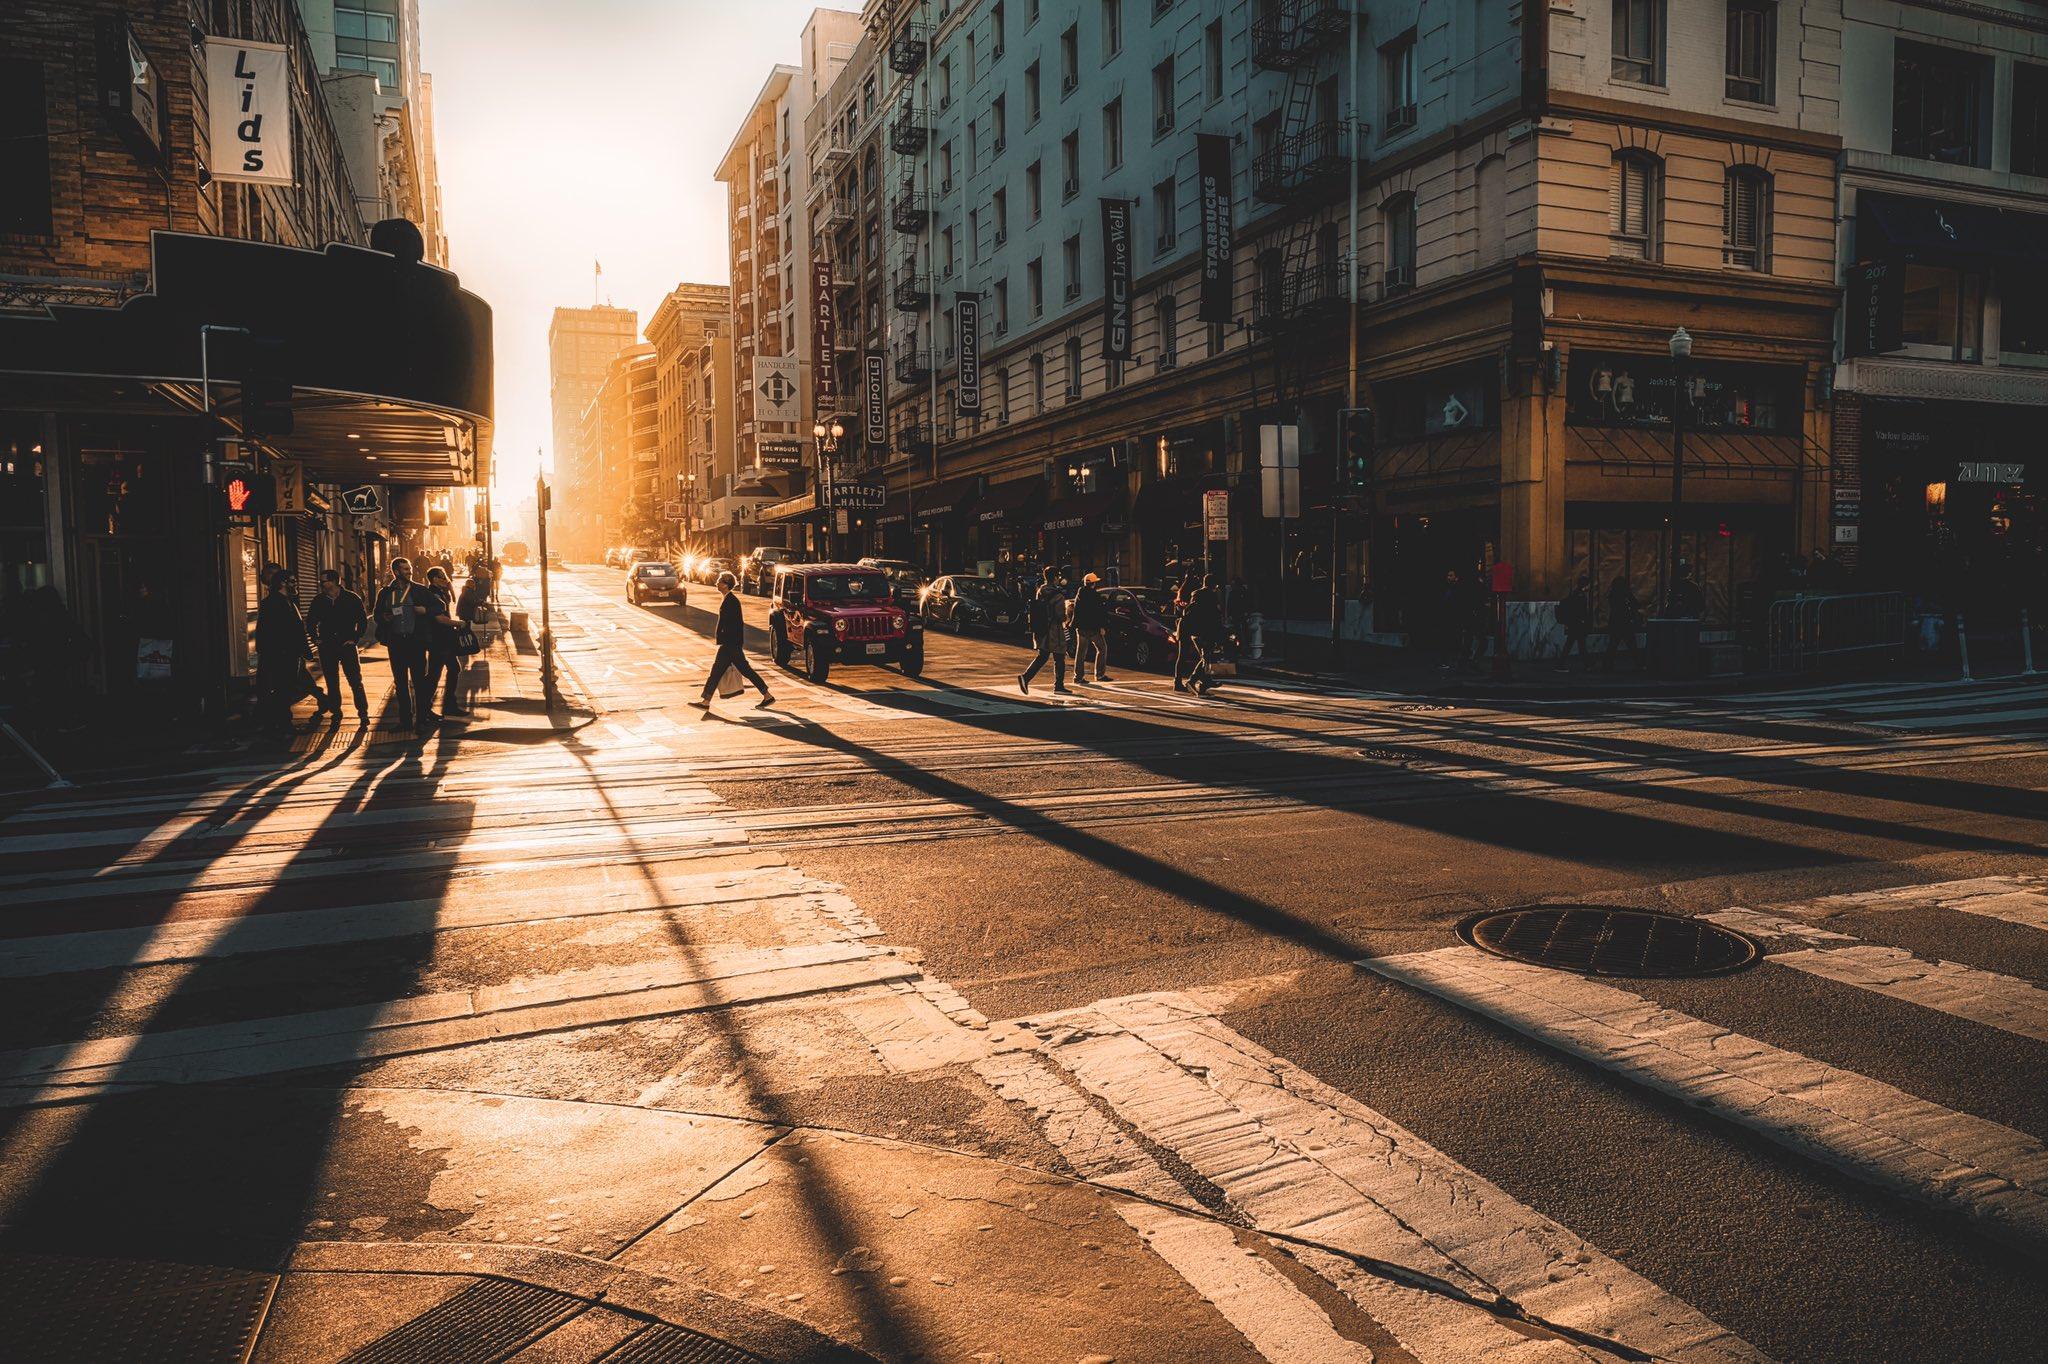 urban_street_photography_38.jpg